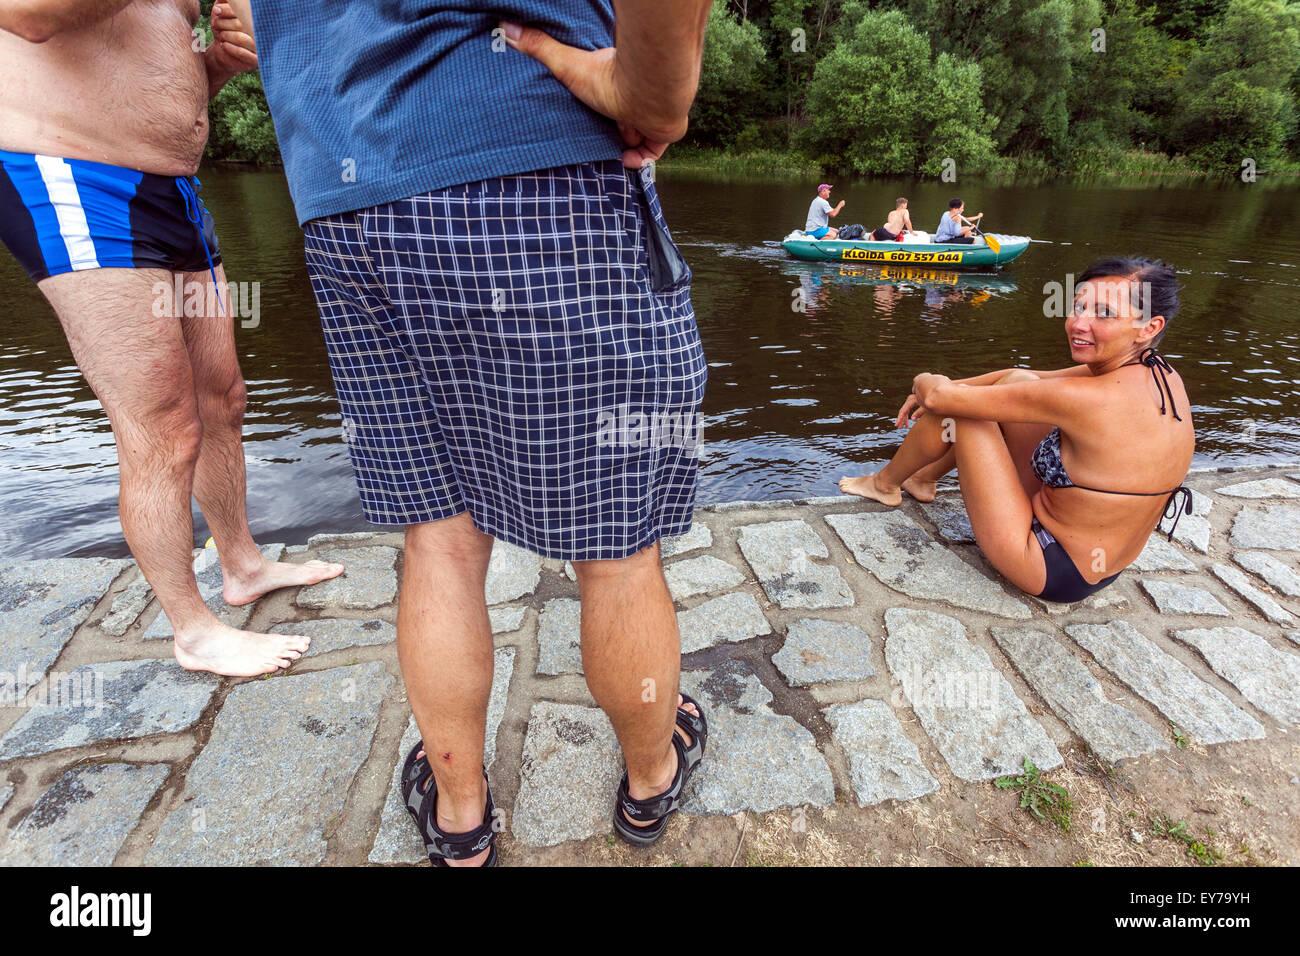 Going down the river Vltava, rafting, South Bohemia, Czech Republic - Stock Image